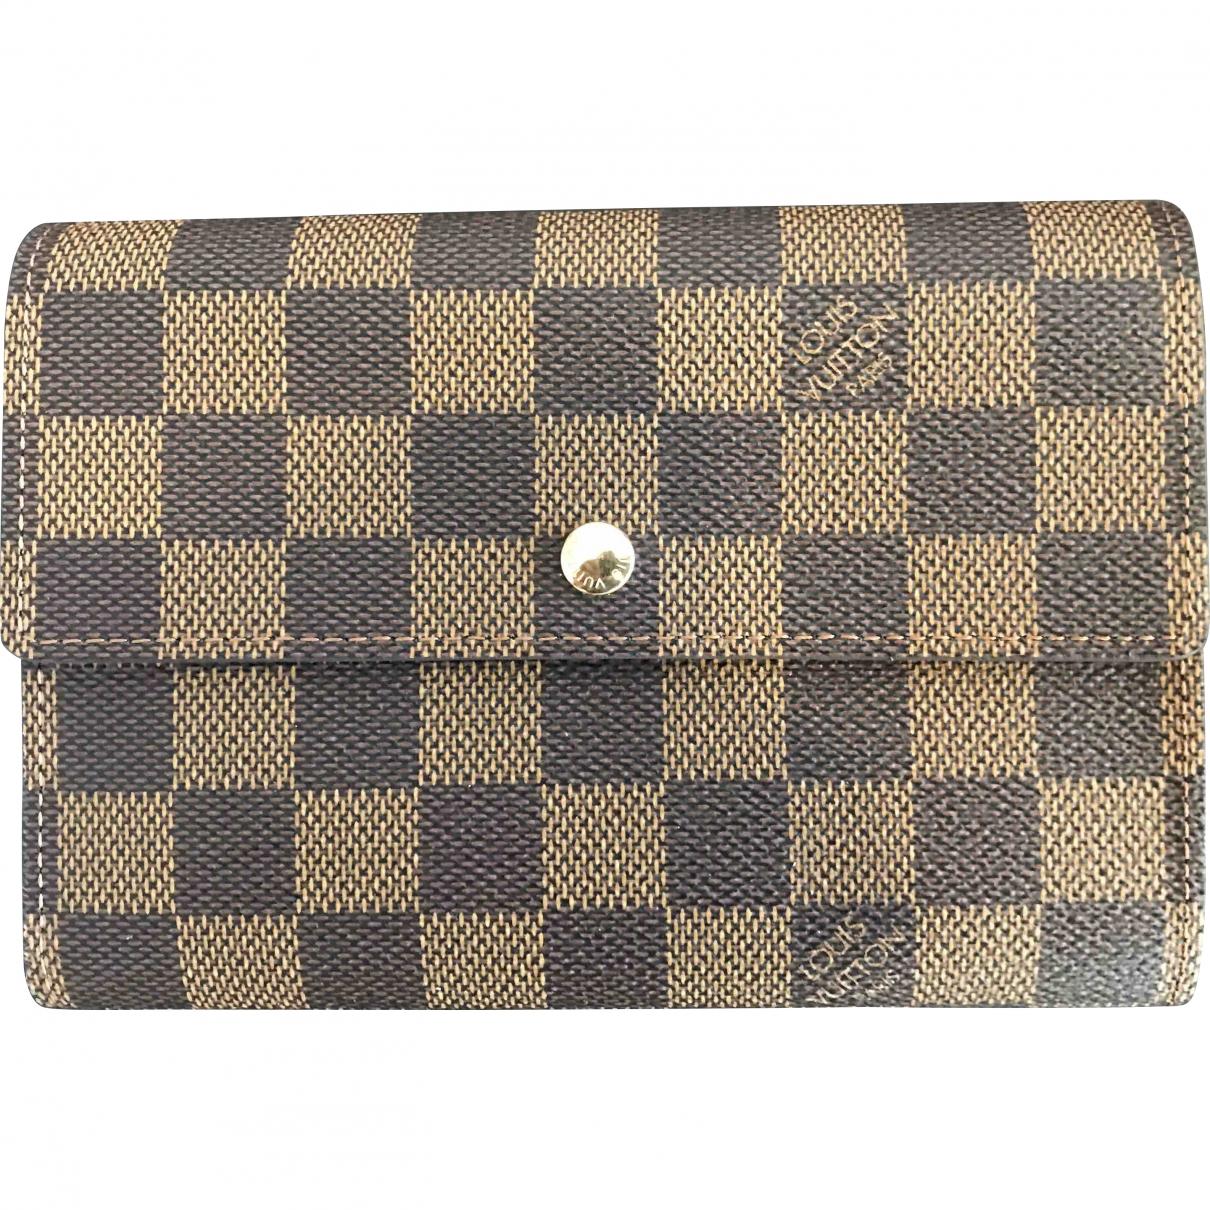 Louis Vuitton \N Brown Cloth wallet for Women \N